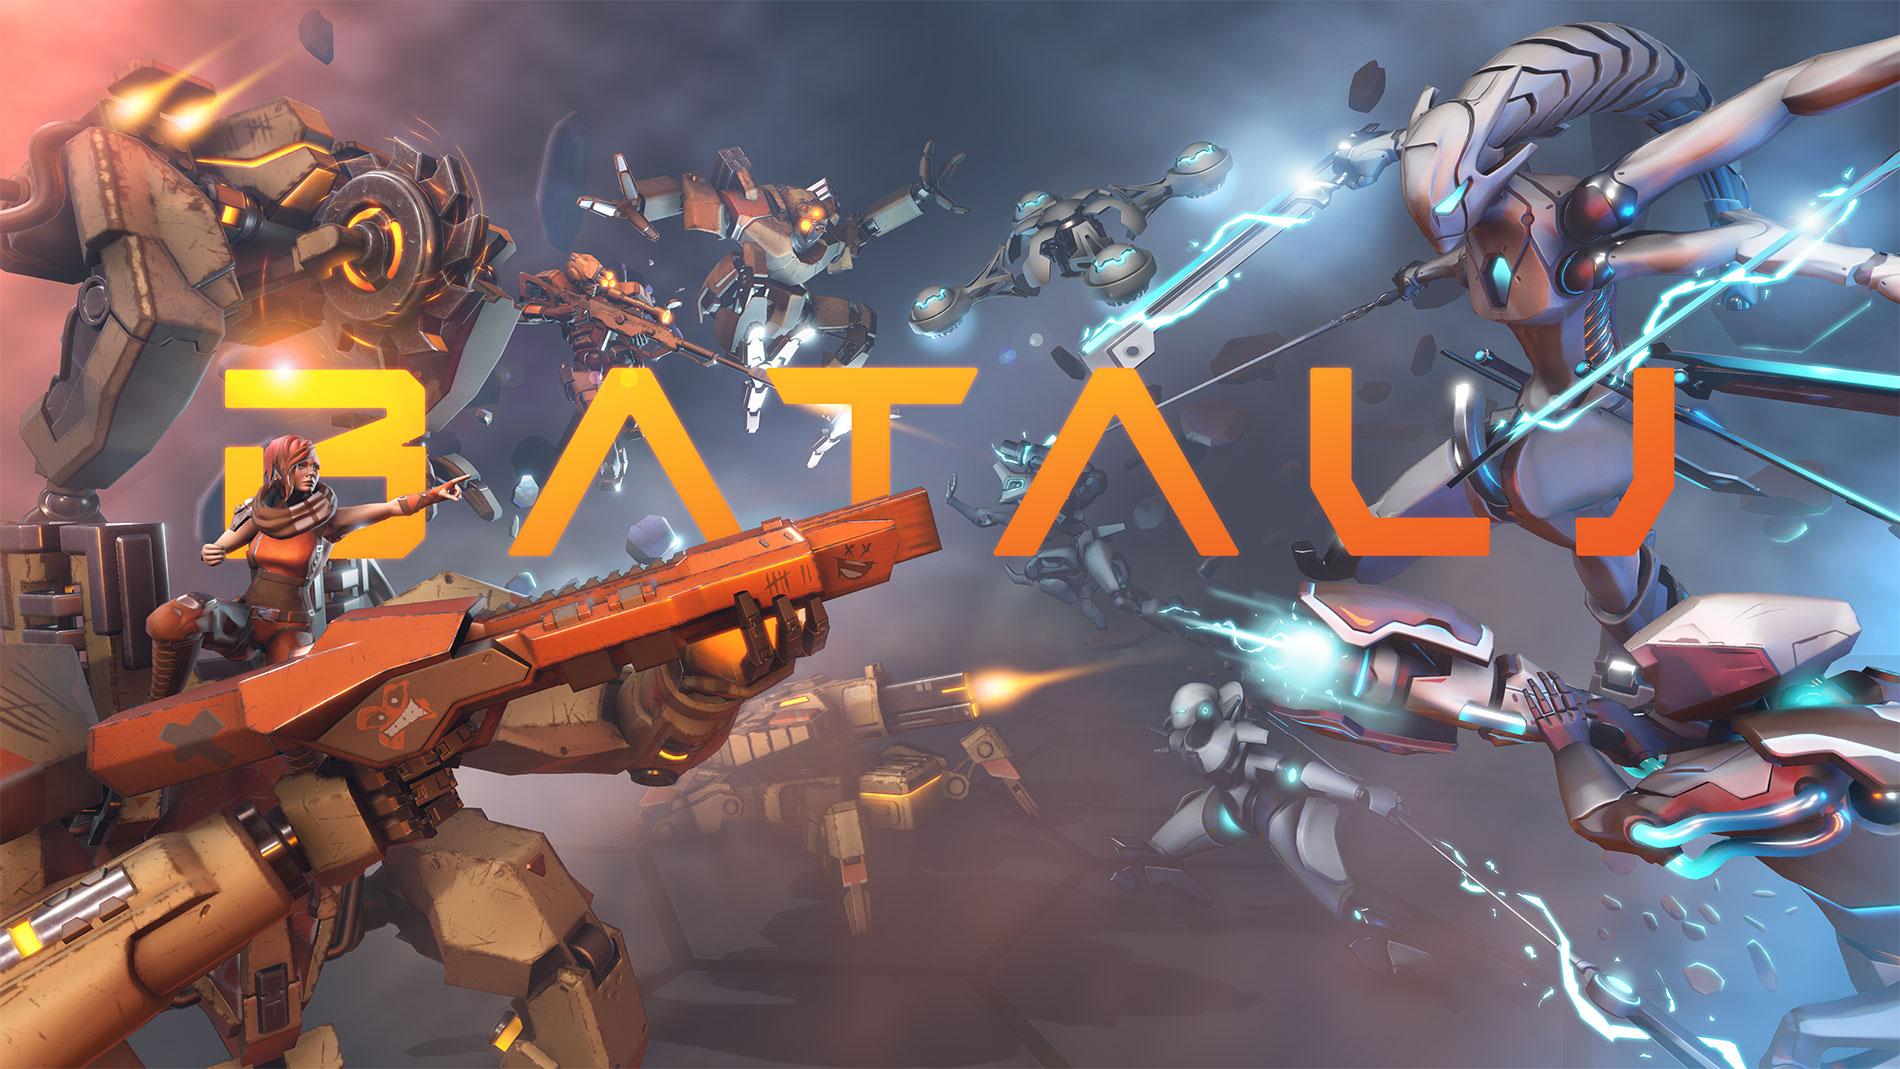 GRATIS key para beta BATALJ en STEAM